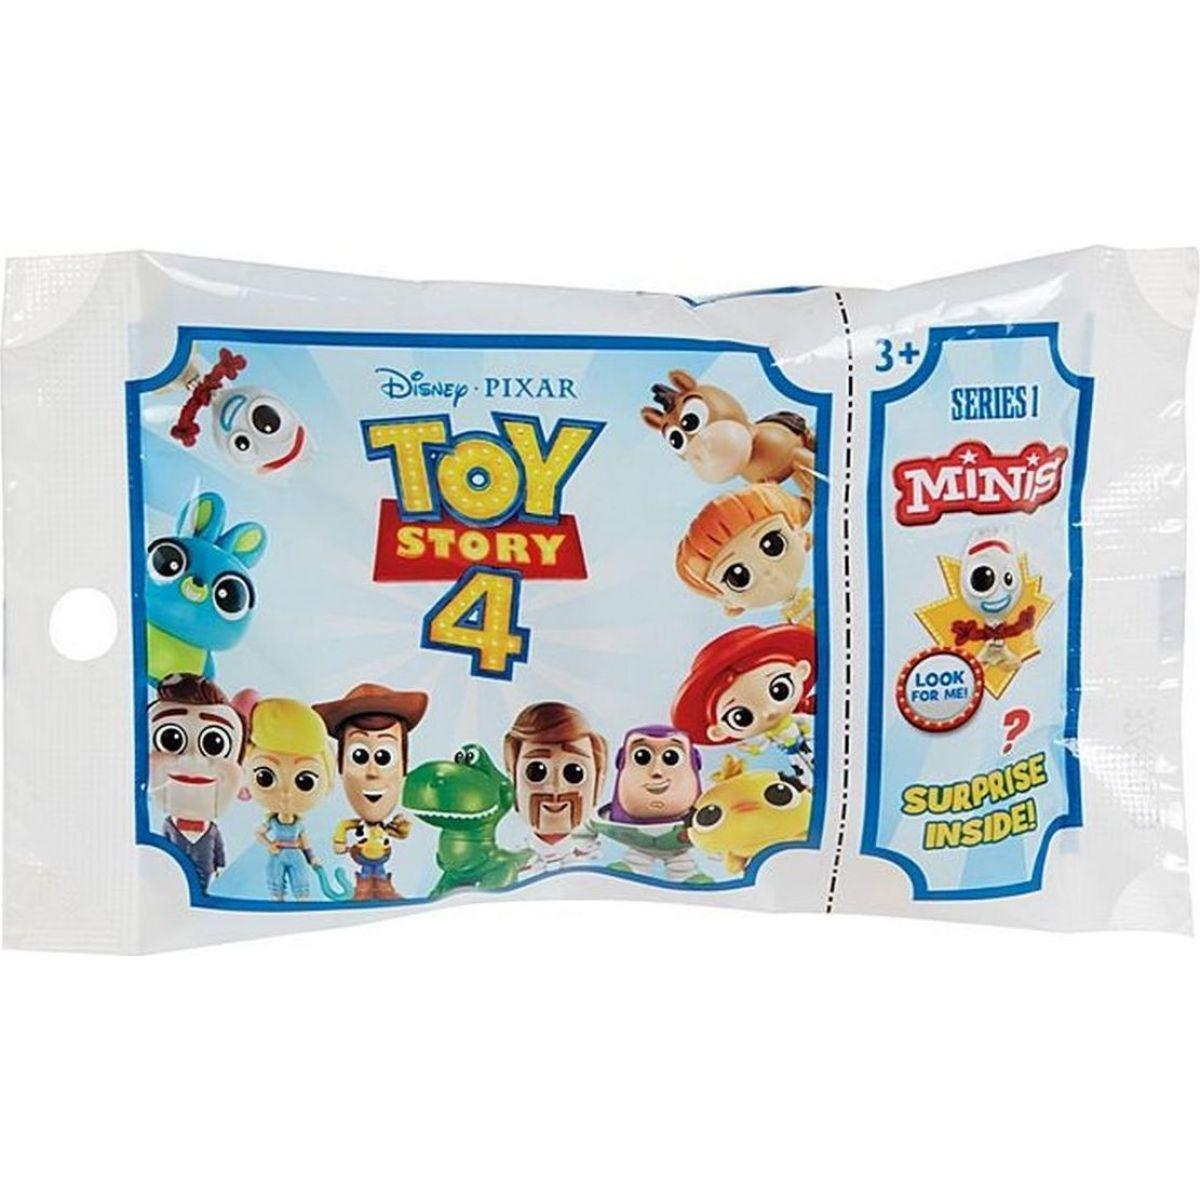 Mattel Toy Story Toy story 4 mini